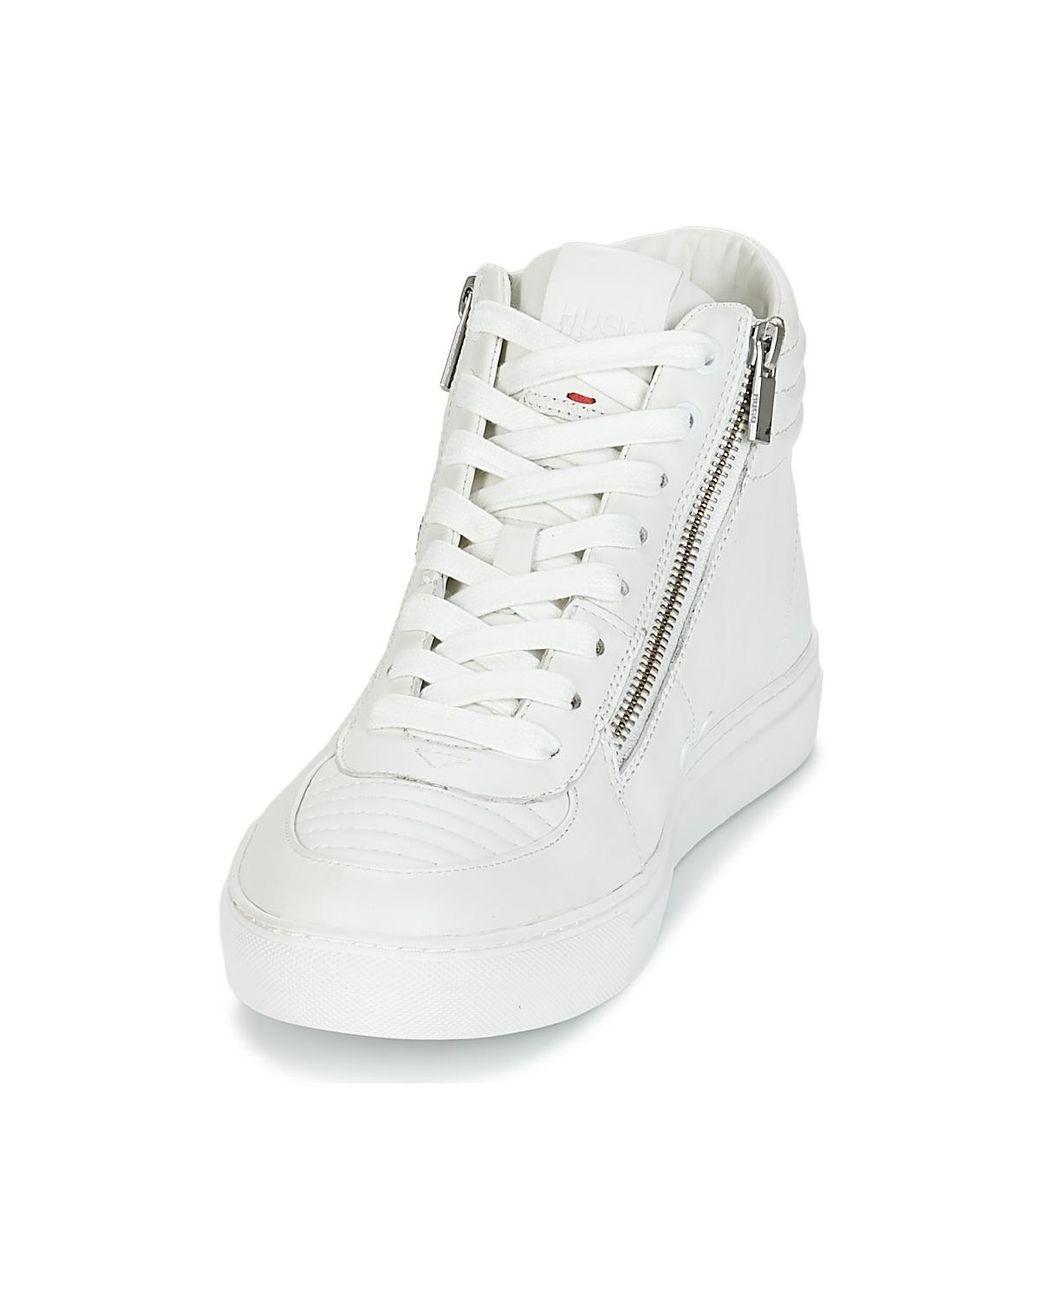 FUTURISM HITO MTZP1 hommes Chaussures en blanc